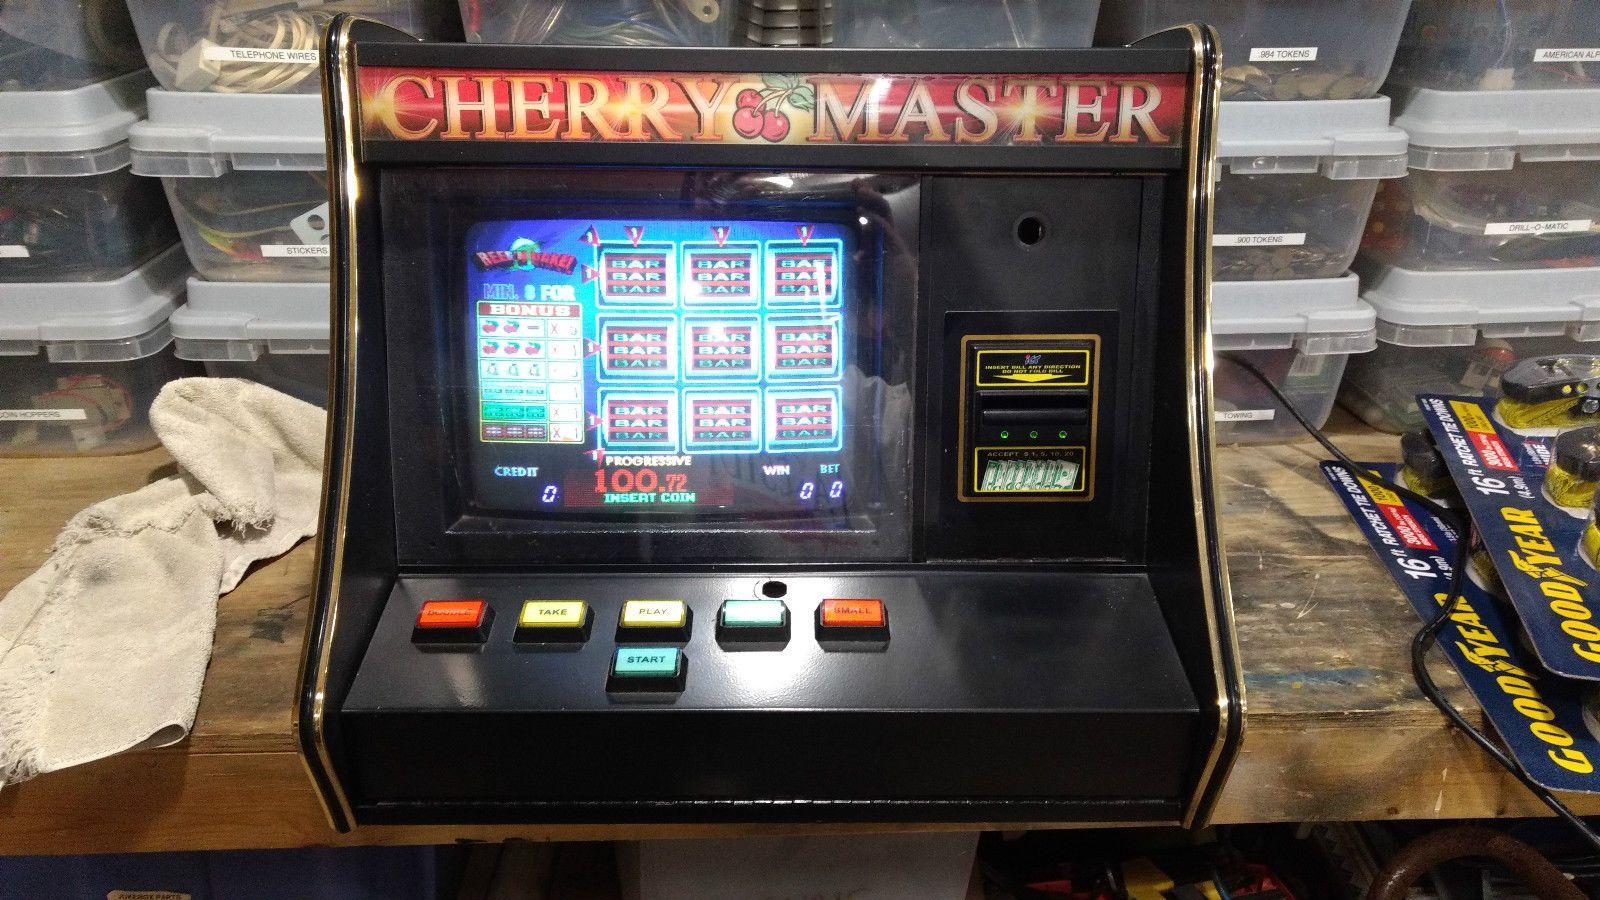 Reel N Quake Countertop Poker Machine 8 Liner Video Arcade Game